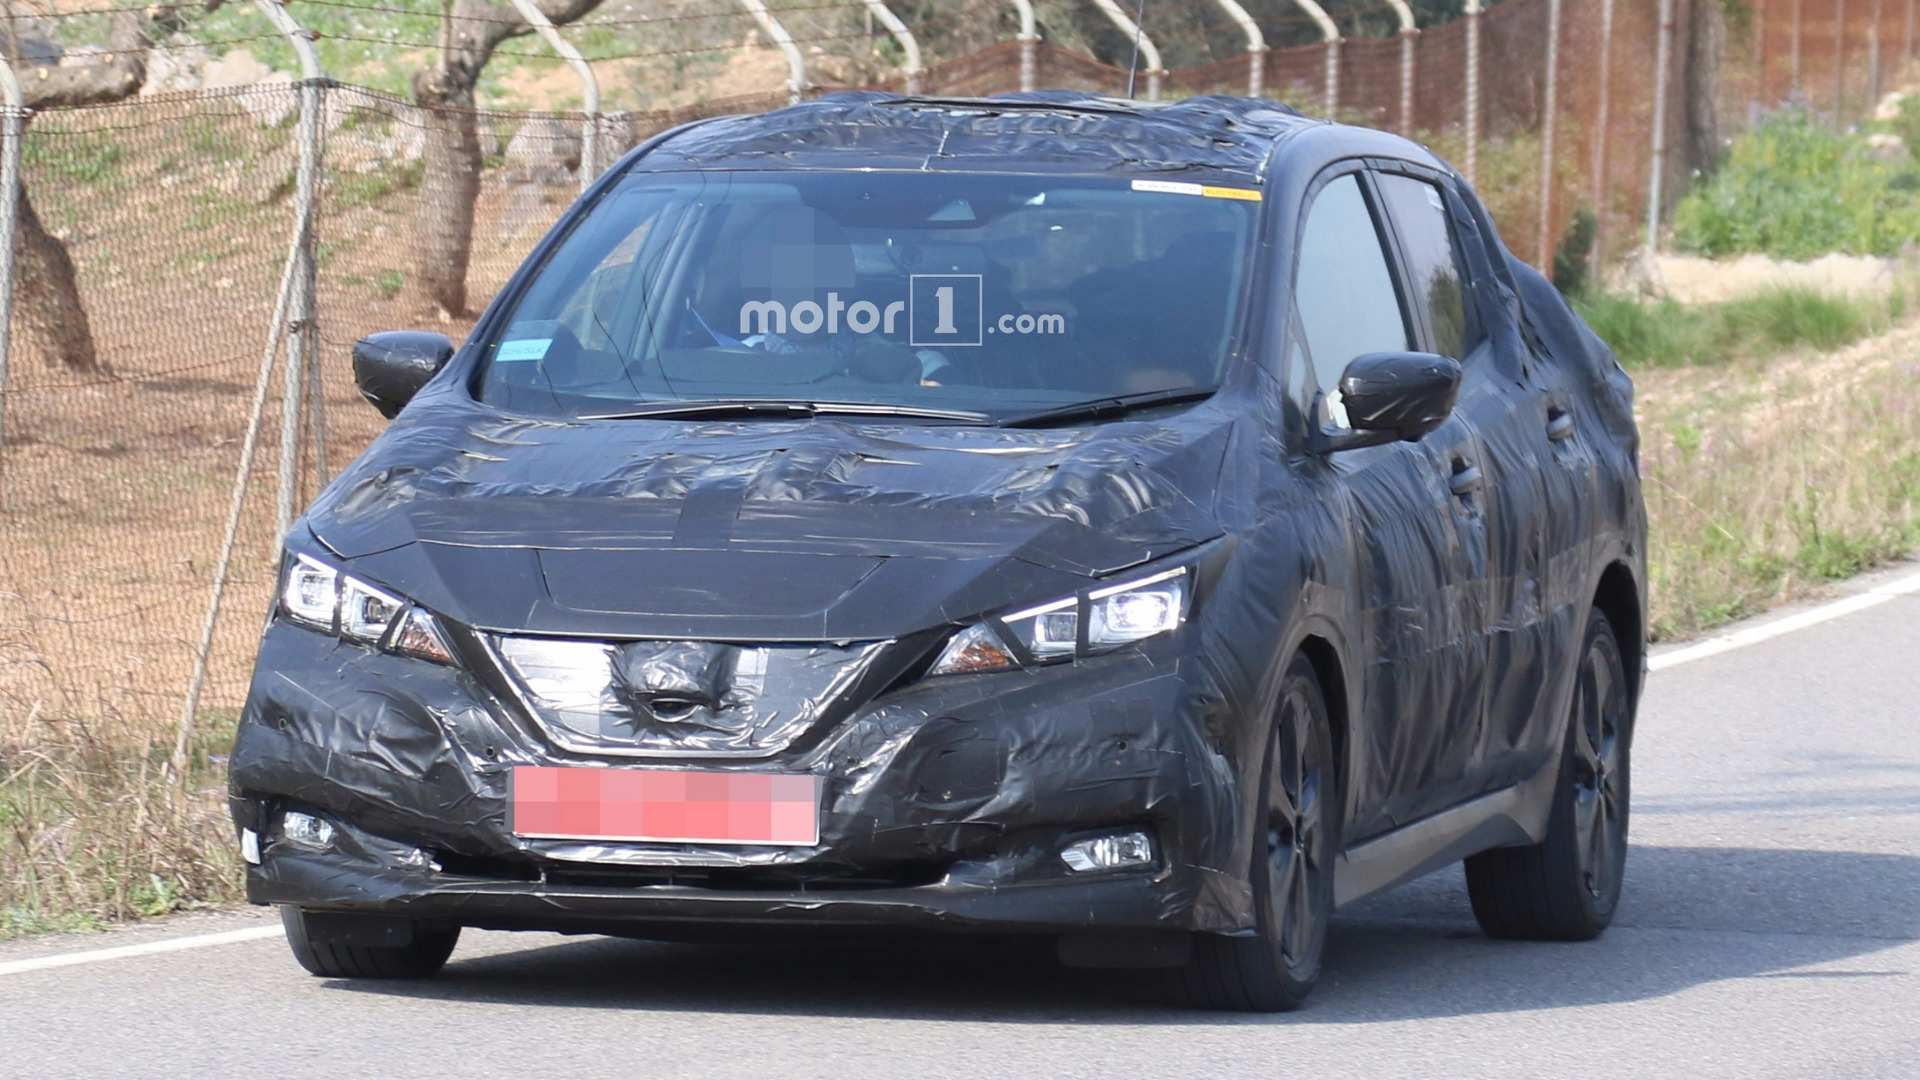 46 Concept of Nissan Leaf 2020 Video Download Exterior with Nissan Leaf 2020 Video Download